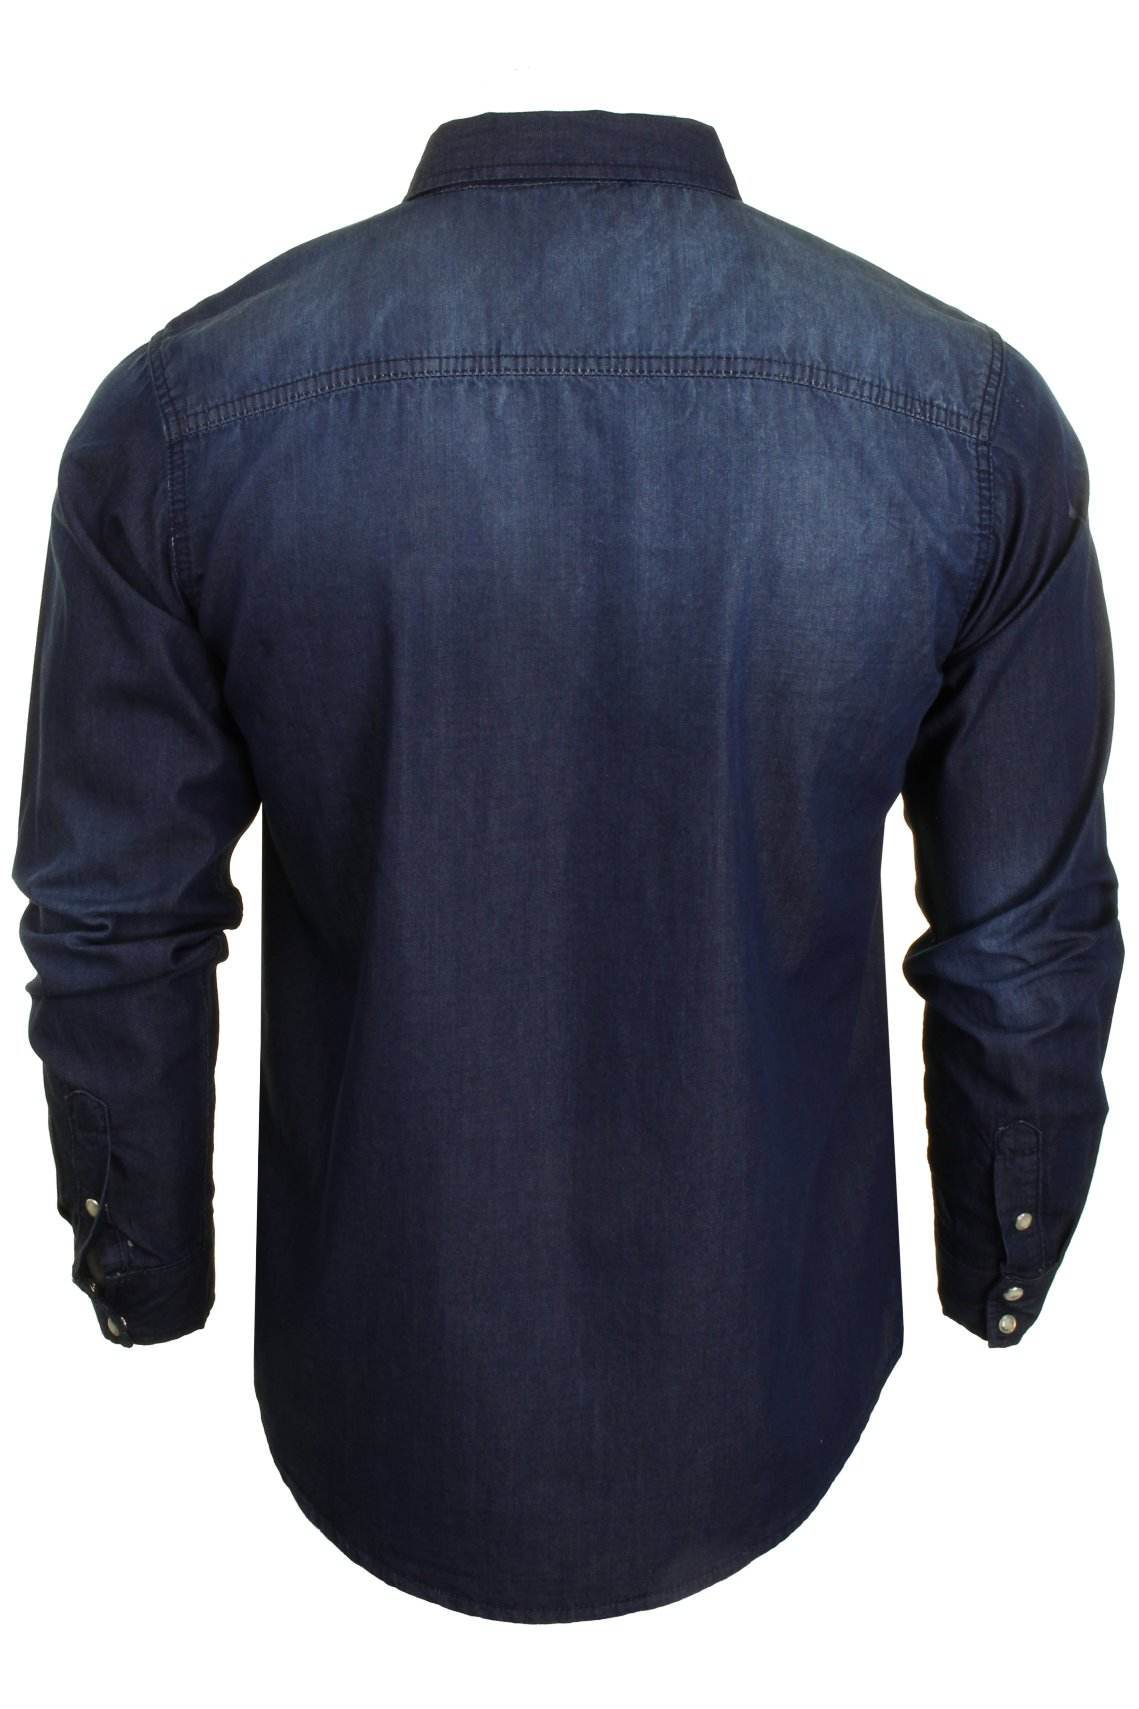 Brave-Soul-Mens-Long-Sleeved-Denim-Shirt thumbnail 8